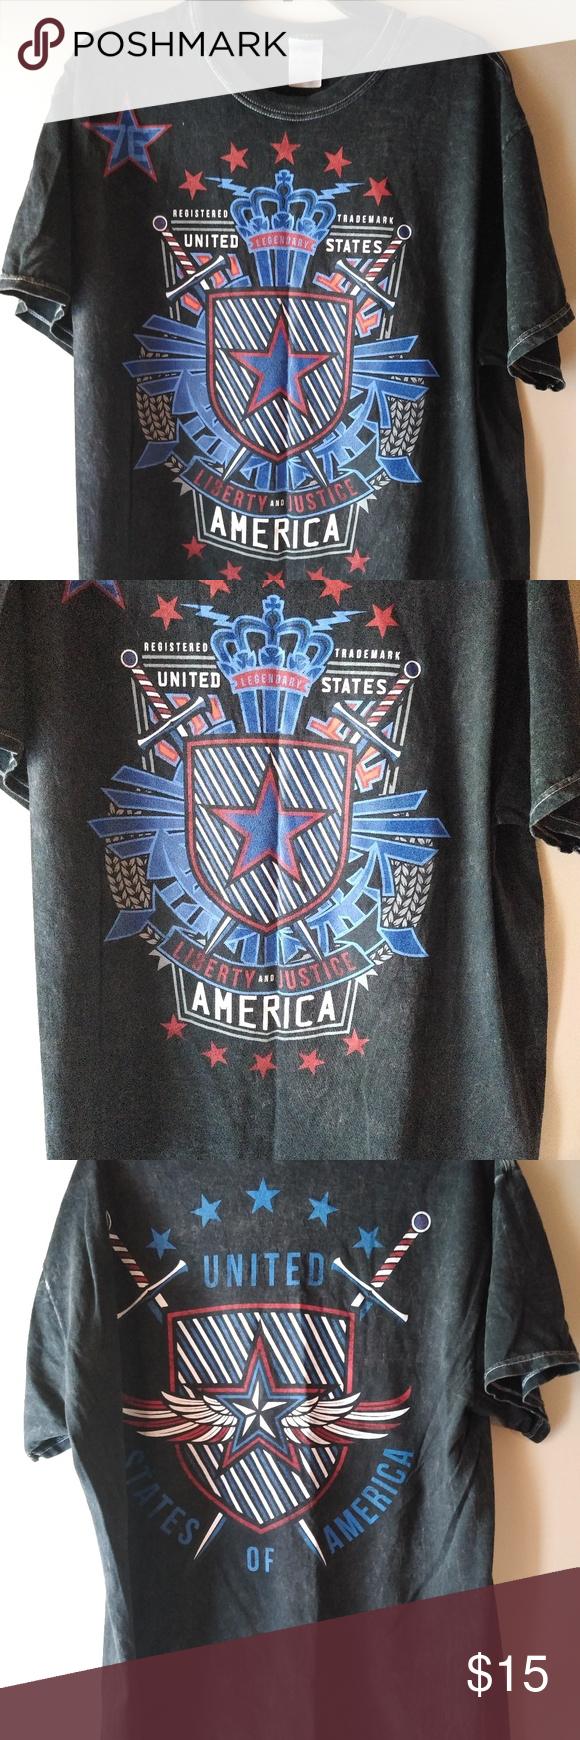 Fruit Of The Loom Mens Graphic TShirt Size XL C1 Shirt